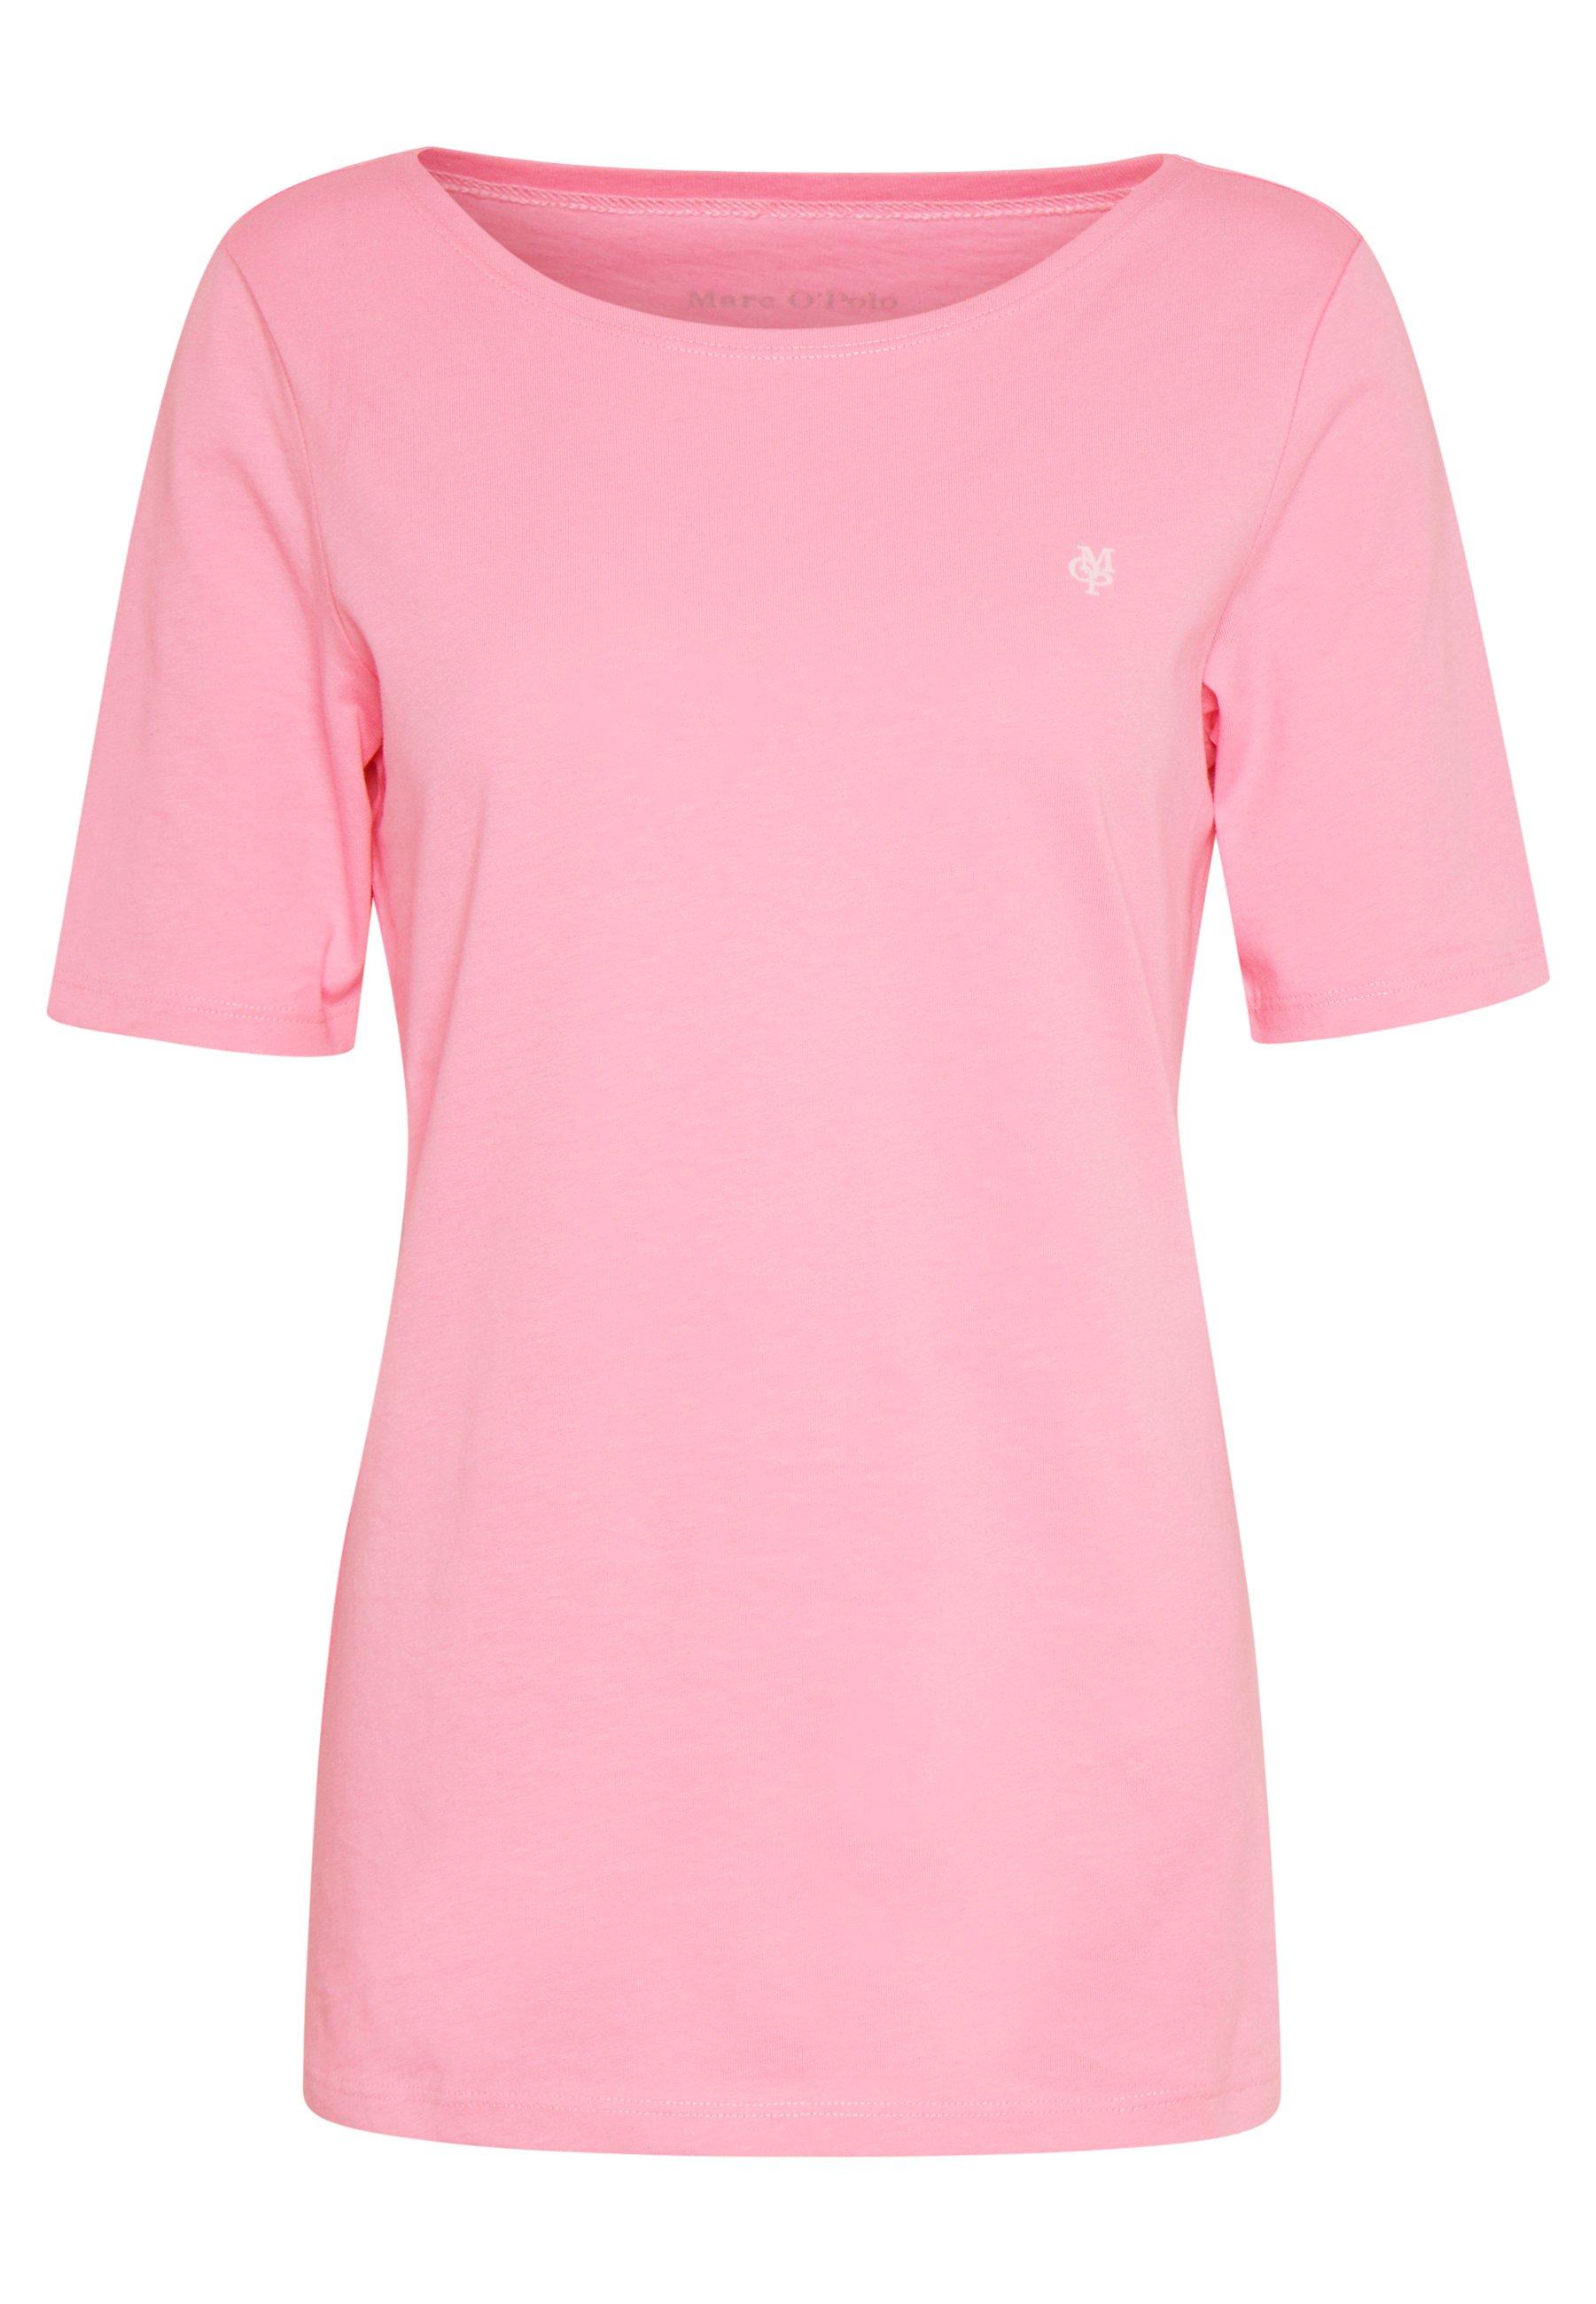 Marc O'Polo SHORT SLEEVE ROUNDNECK T shirt basic